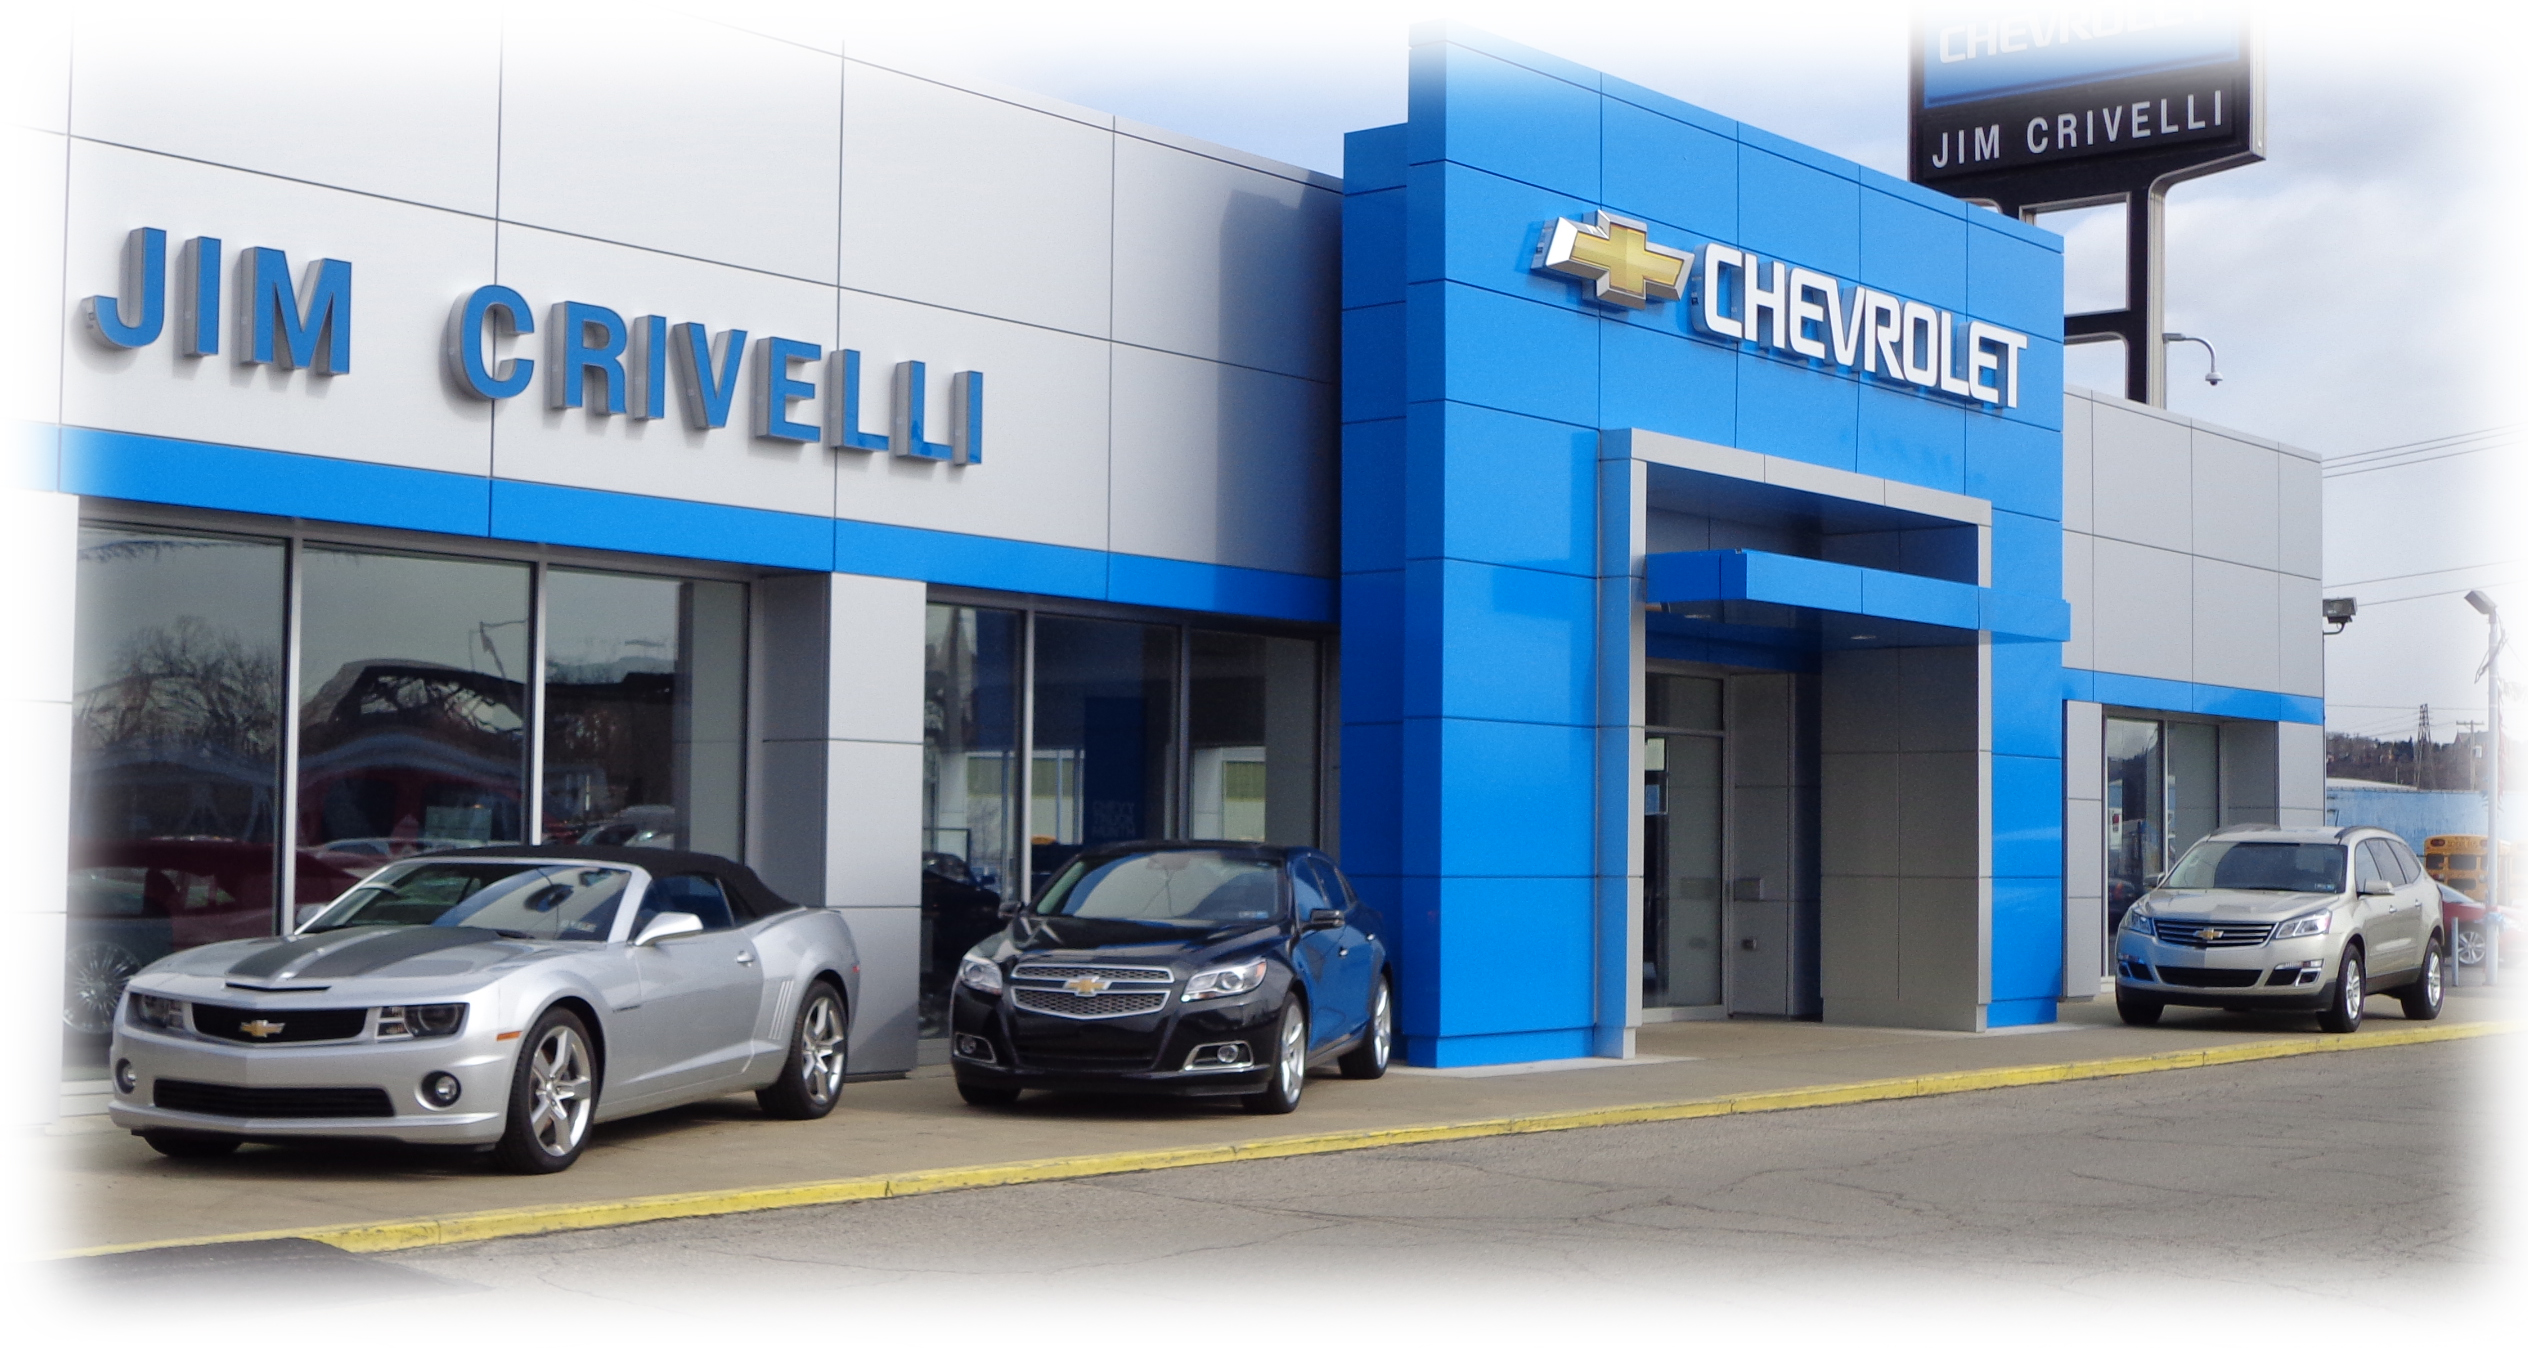 Jim Crivelli Chevrolet, Mc Kees Rocks PA